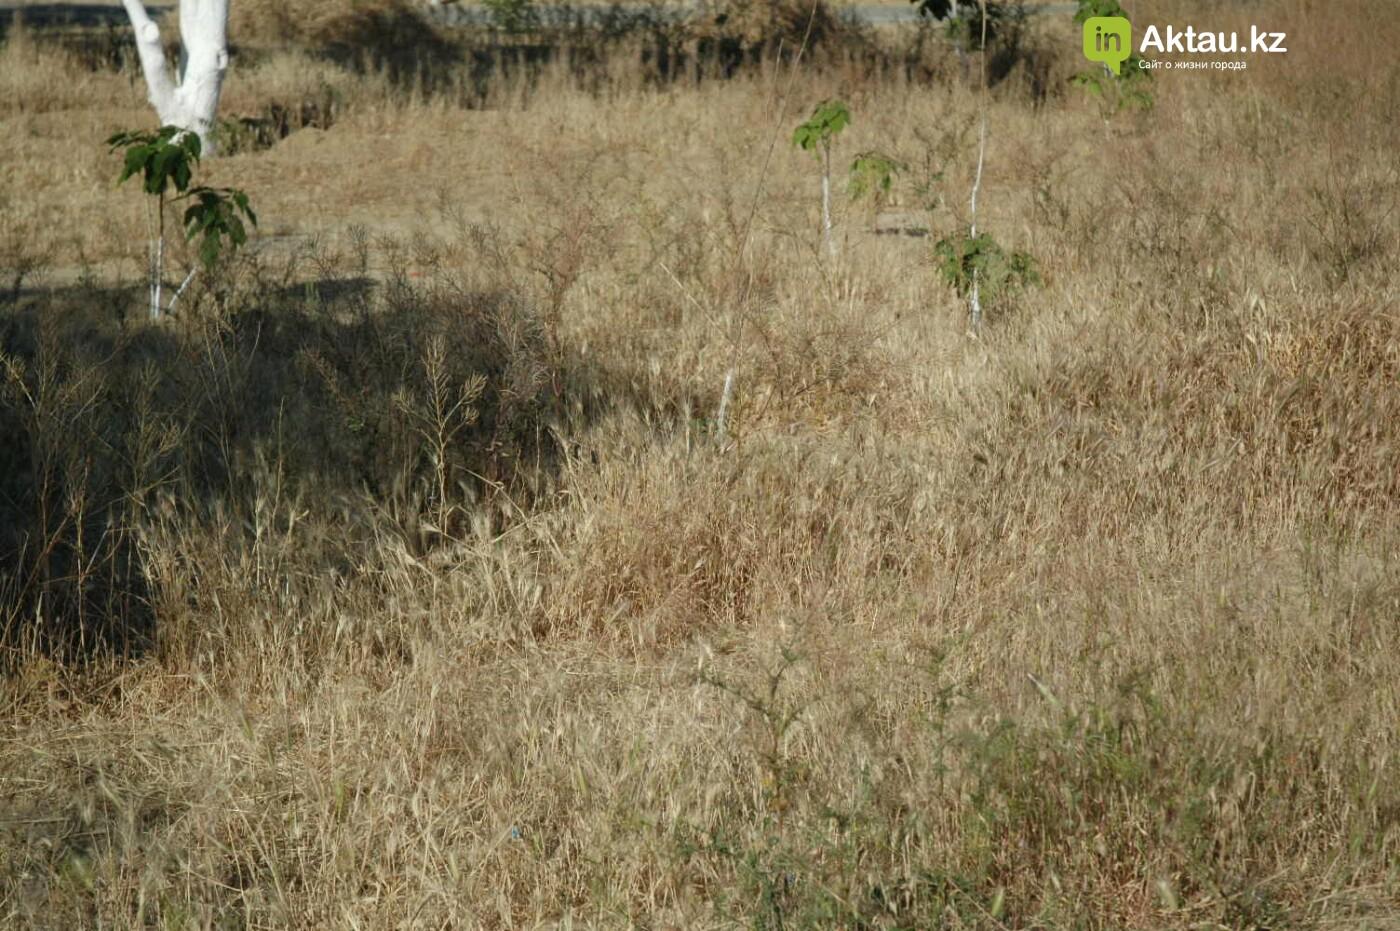 Погибшие от засухи и обезвоживания в Актау исчисляются десятками (ФОТО), фото-37